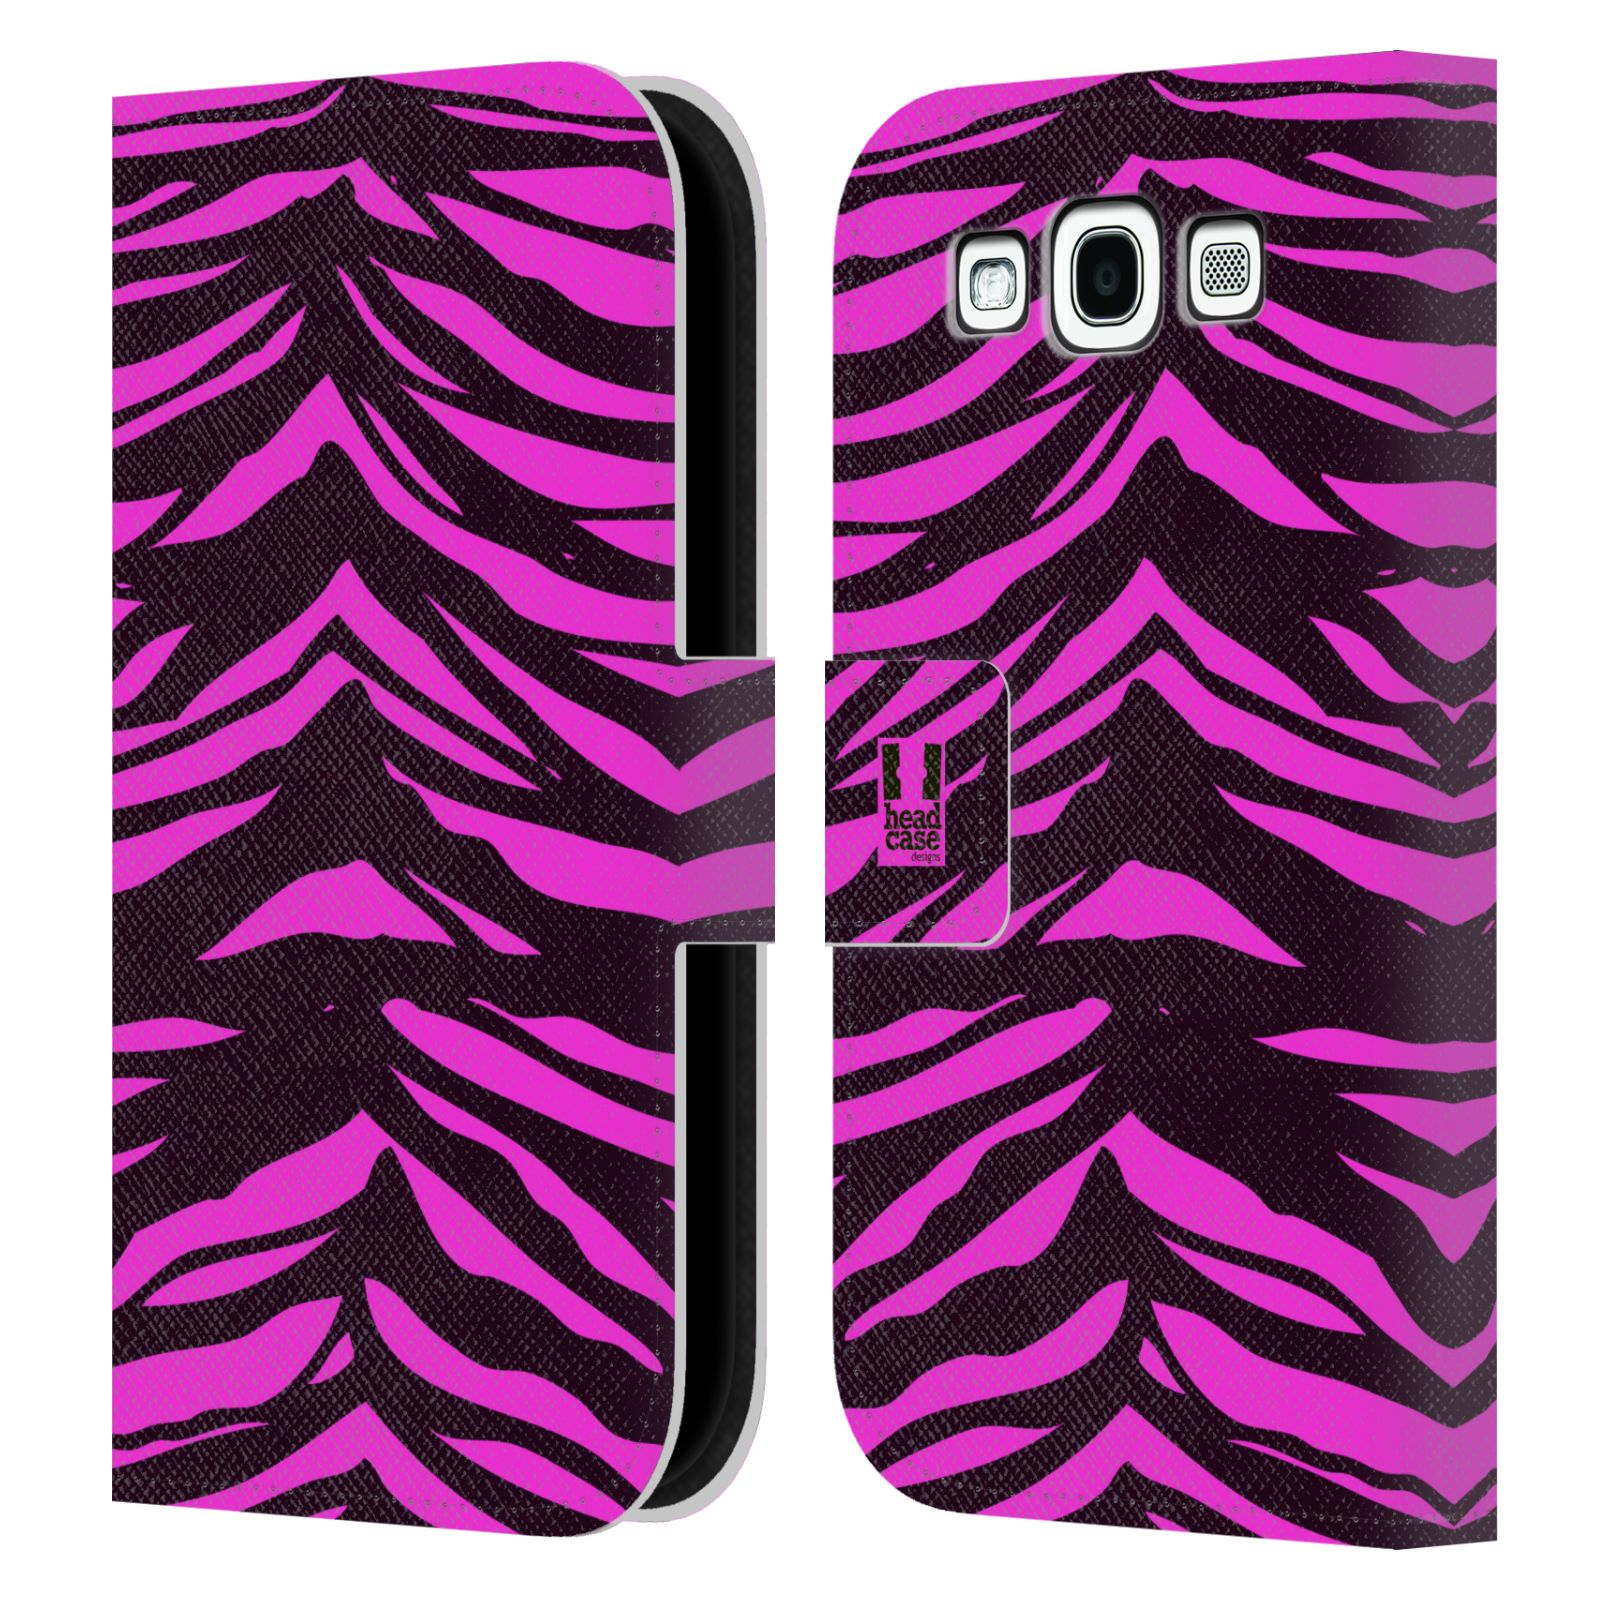 HEAD CASE Flipové pouzdro pro mobil Samsung Galaxy S3 Zvířecí barevné vzory fialová tygr